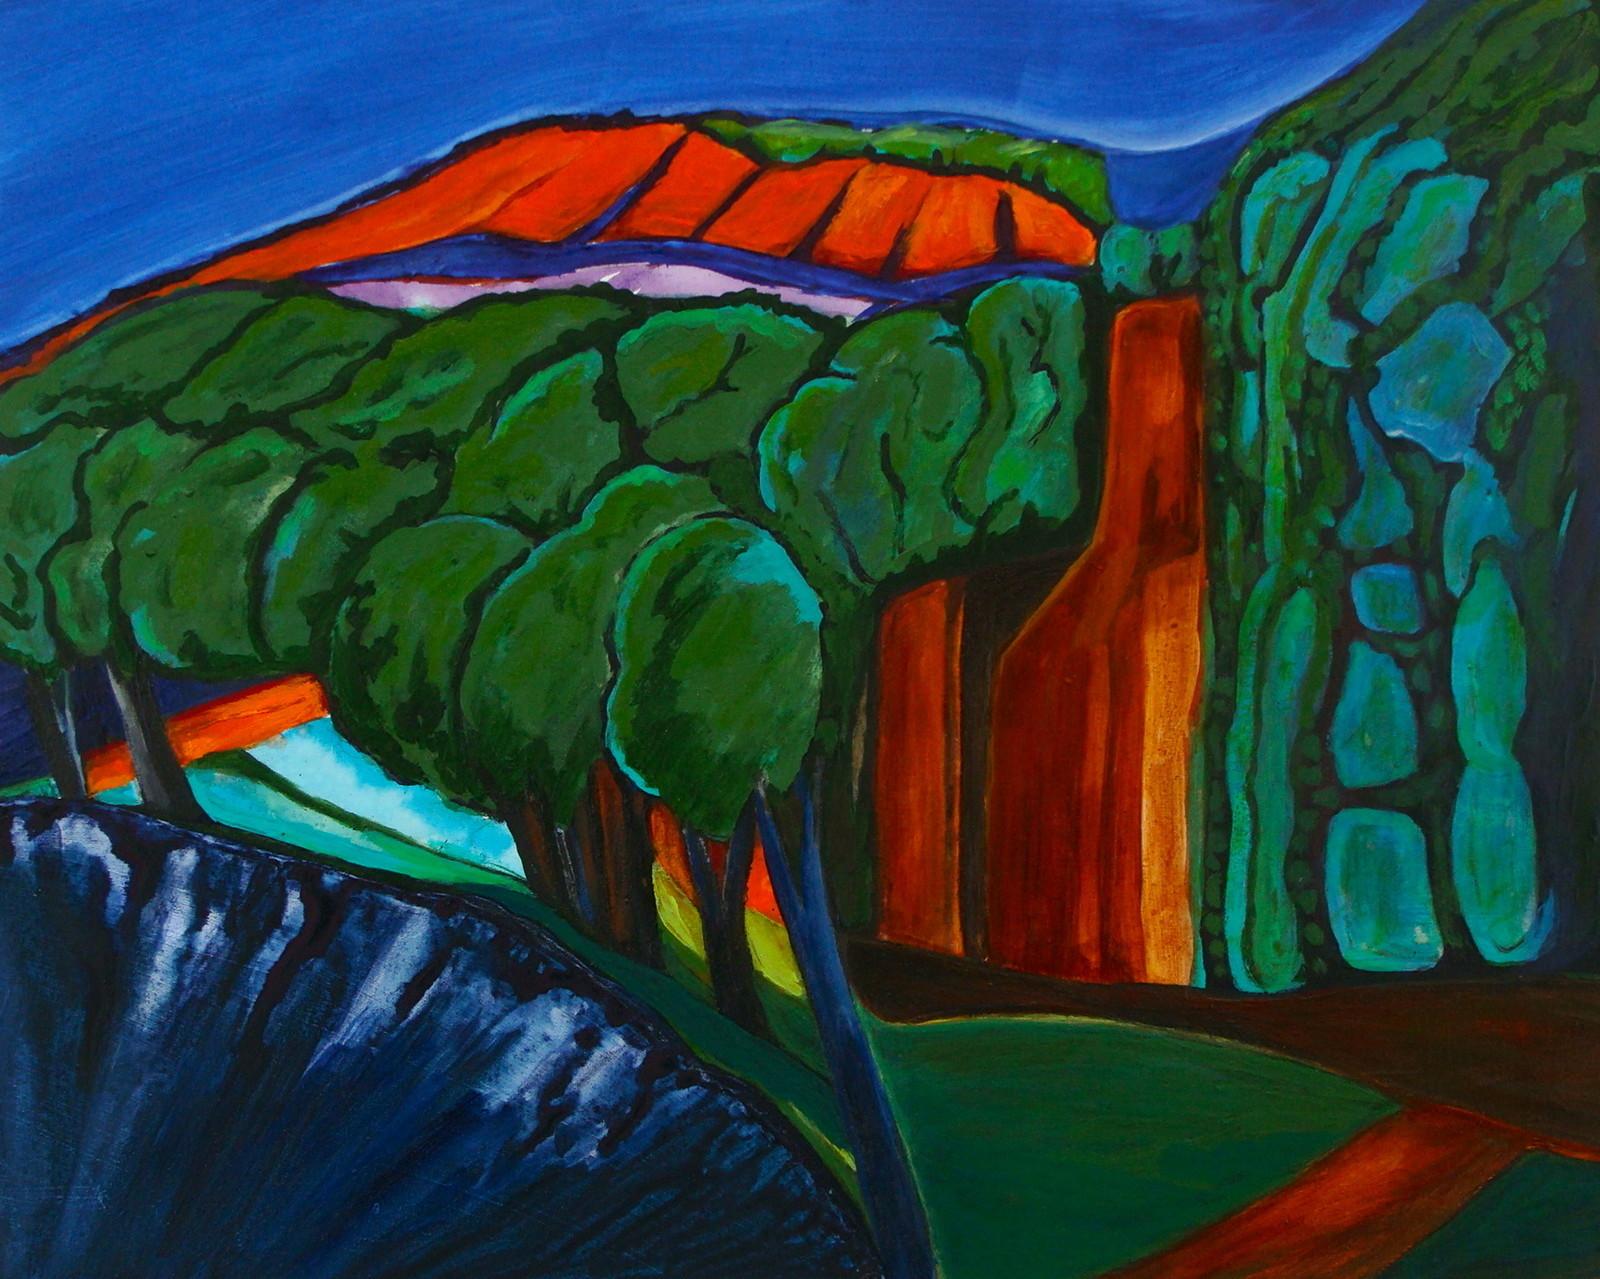 Sunset's Glow, oil on canvas, 20 x 16